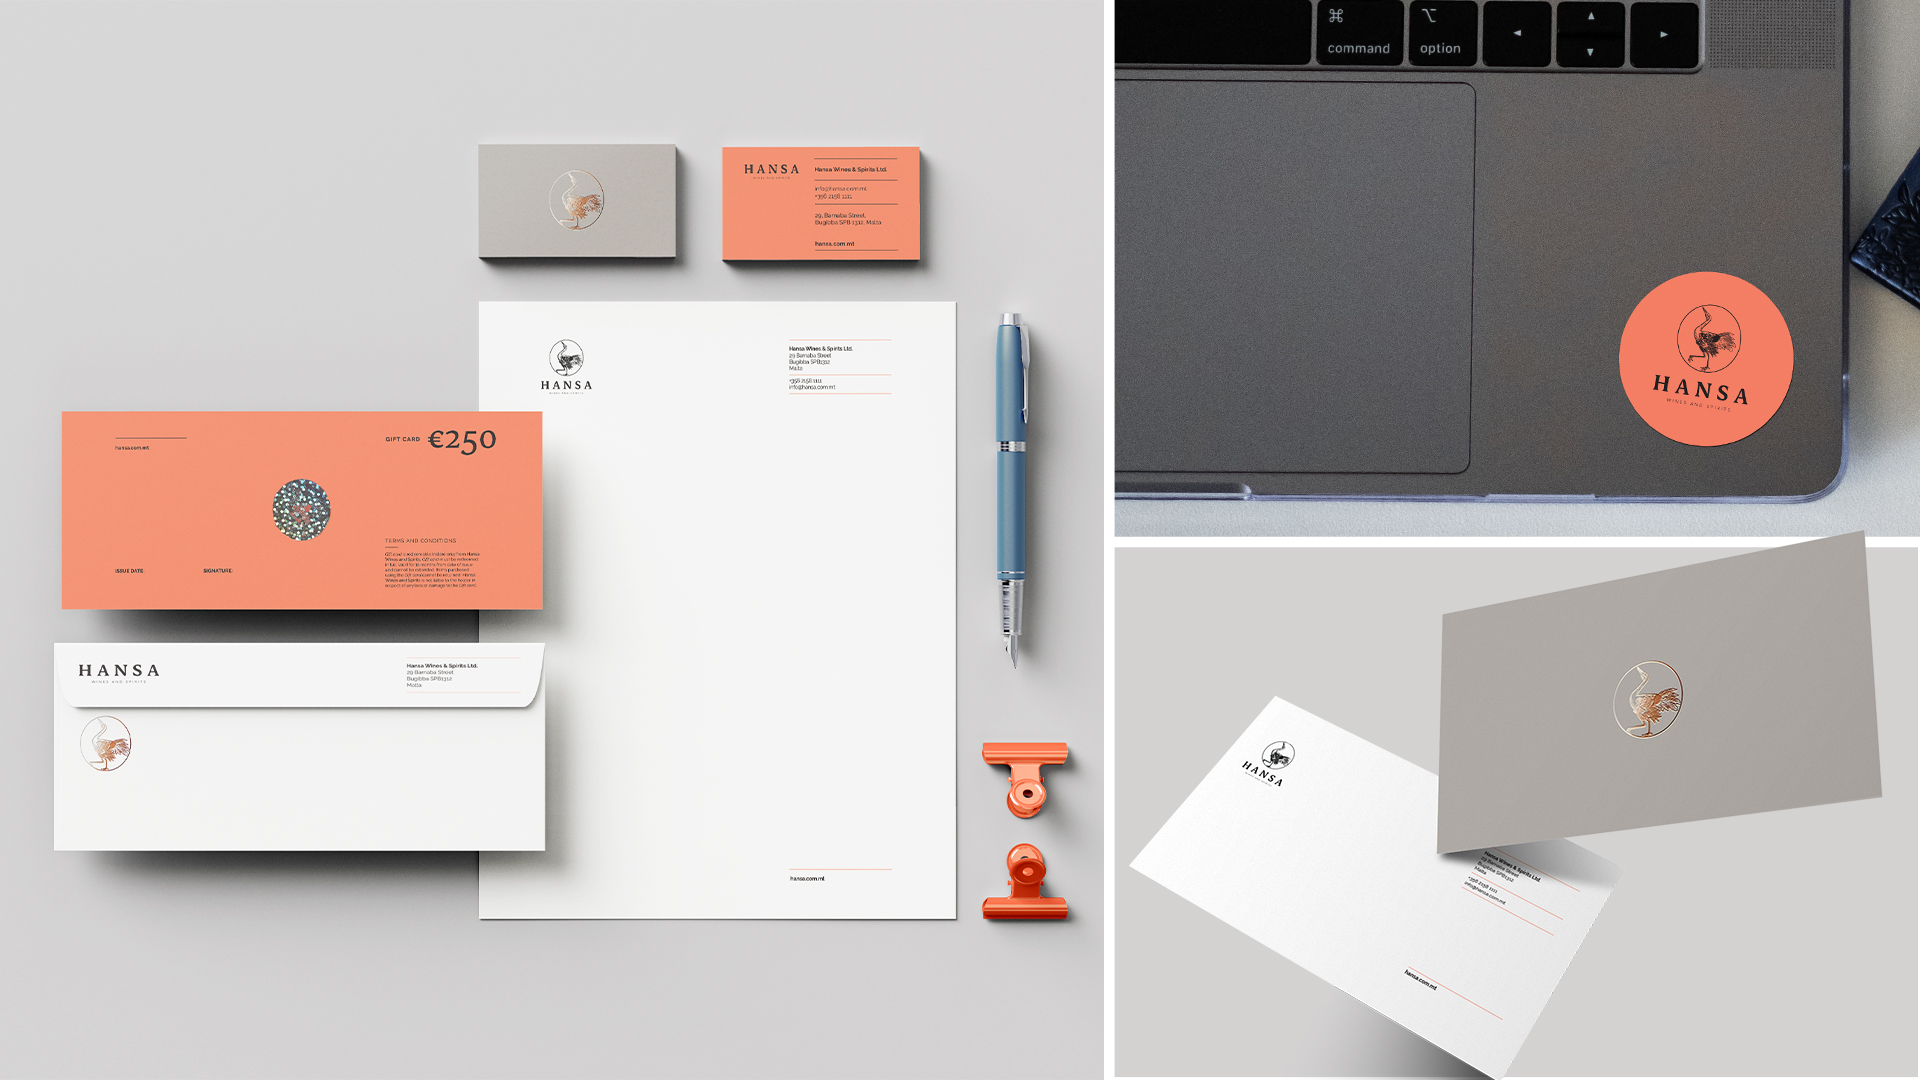 stationary design, letterhead design, voucher design and business cards